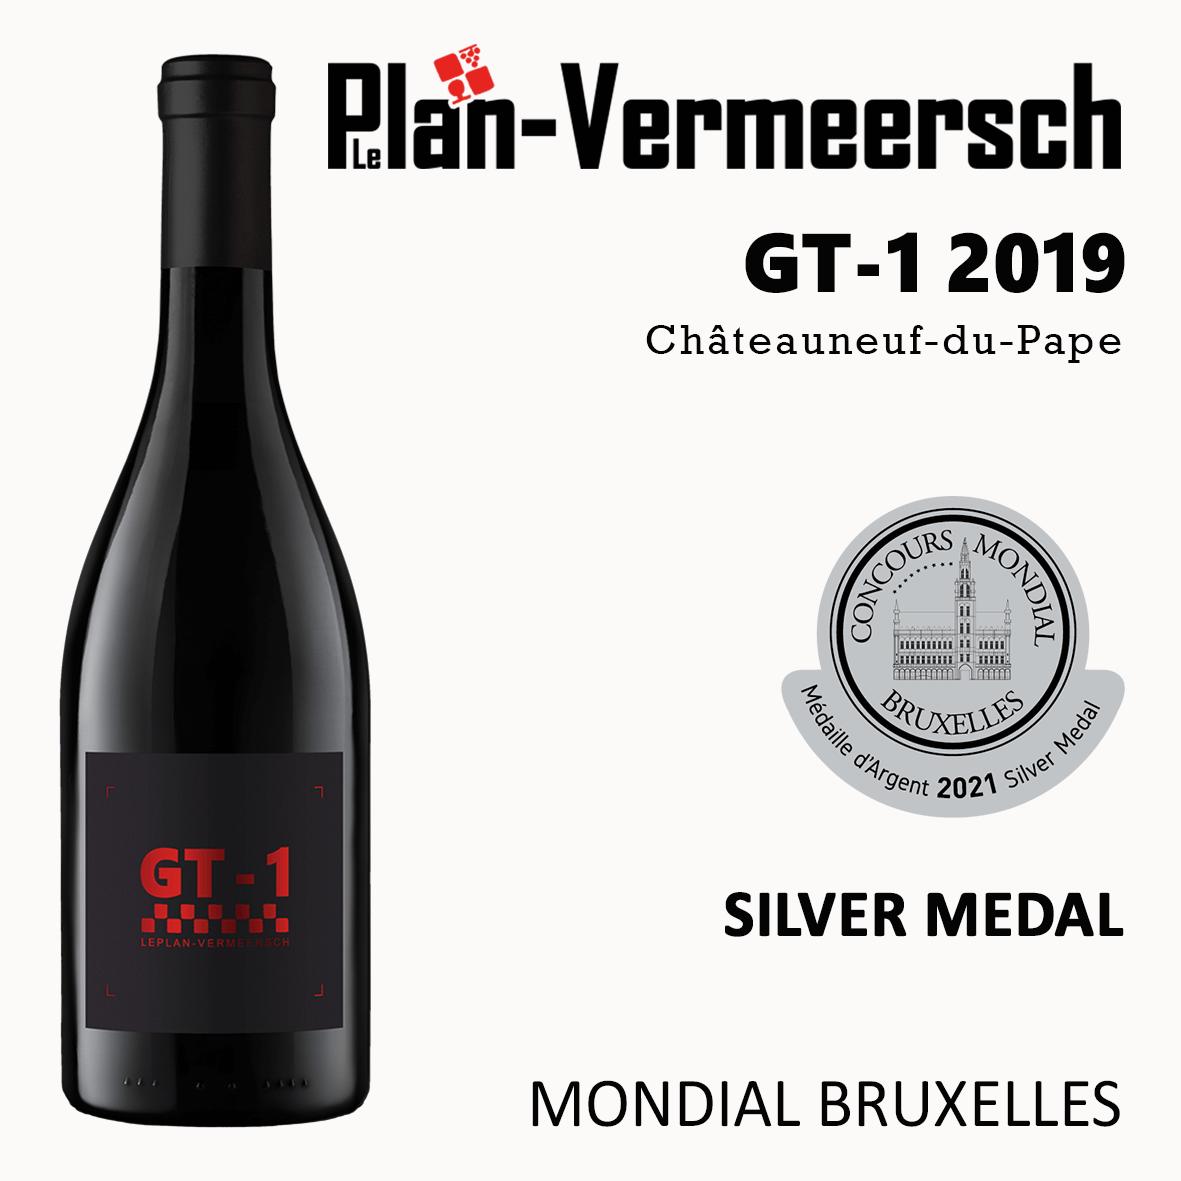 Bottle of wine Chateauneuf du Pape GT-1 silver medal mondial bruxelles LePlan-Vermeersch